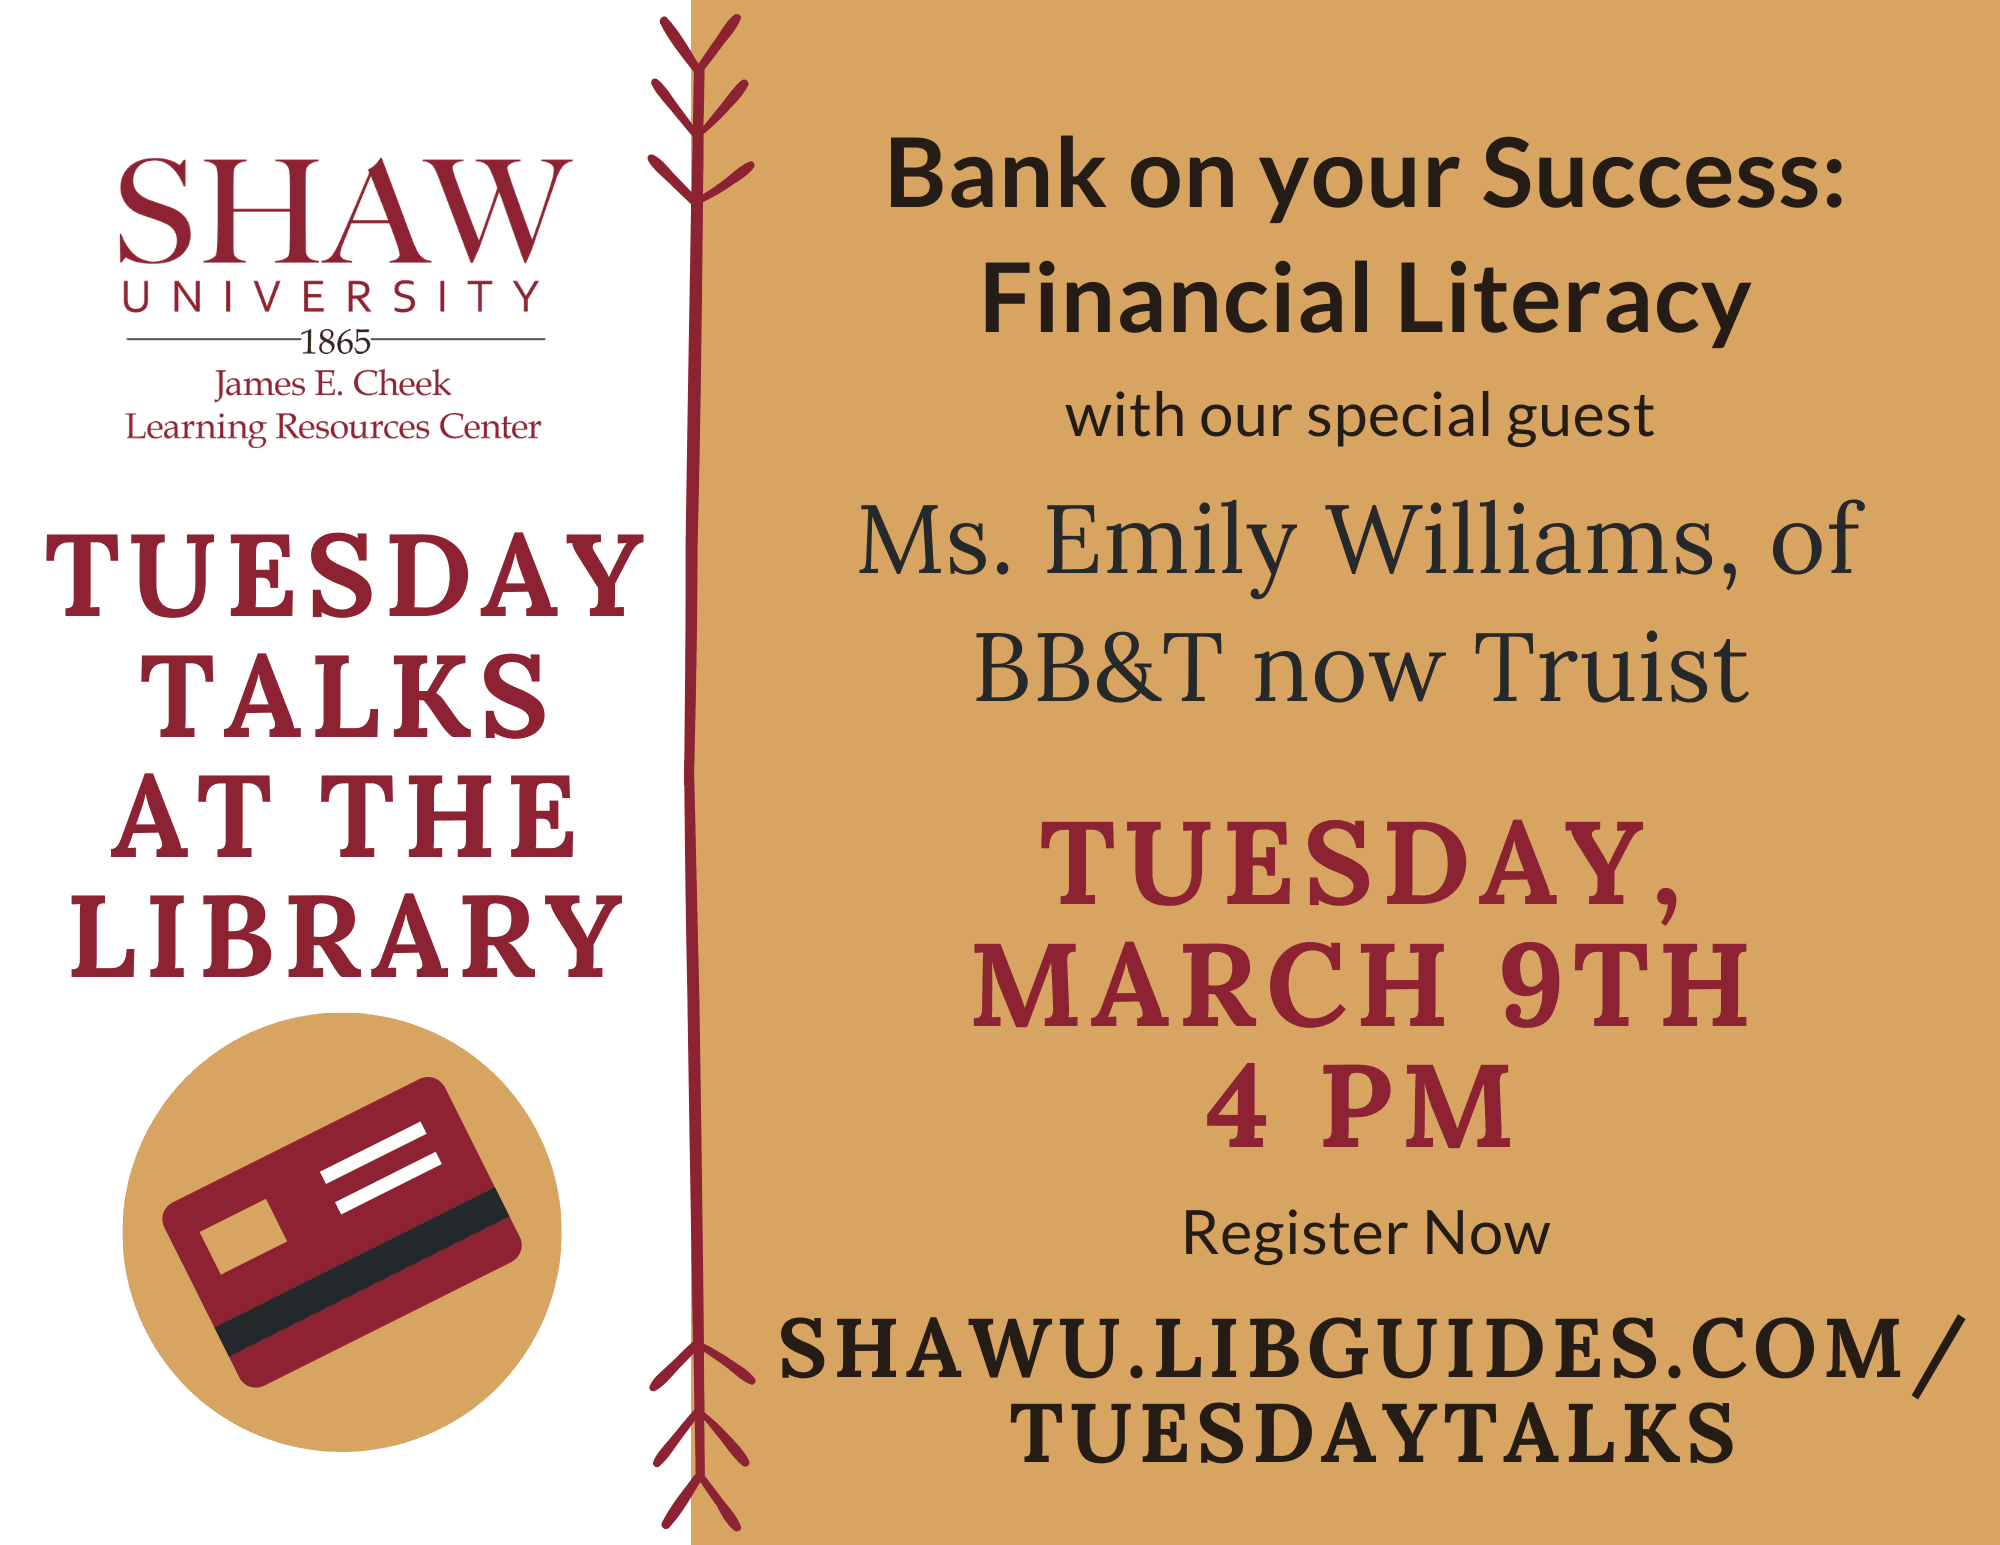 University Library - Tuesday Talks- Emily Williams, BB&T